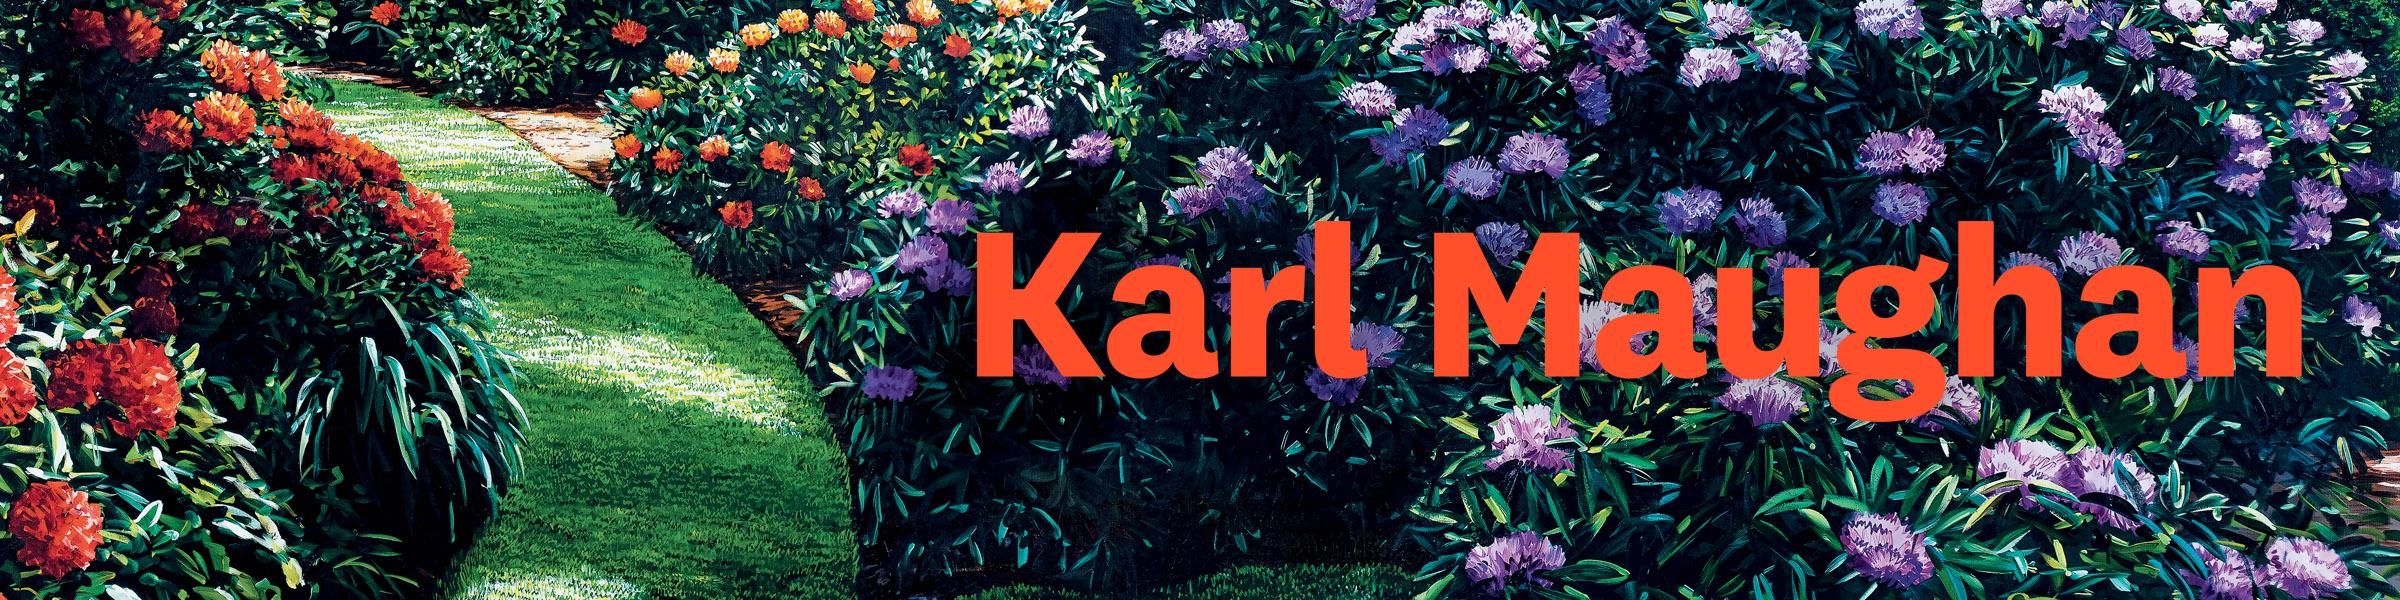 KARL MAUGHAN Edited by Hannah Valentine & Gabriella Stead